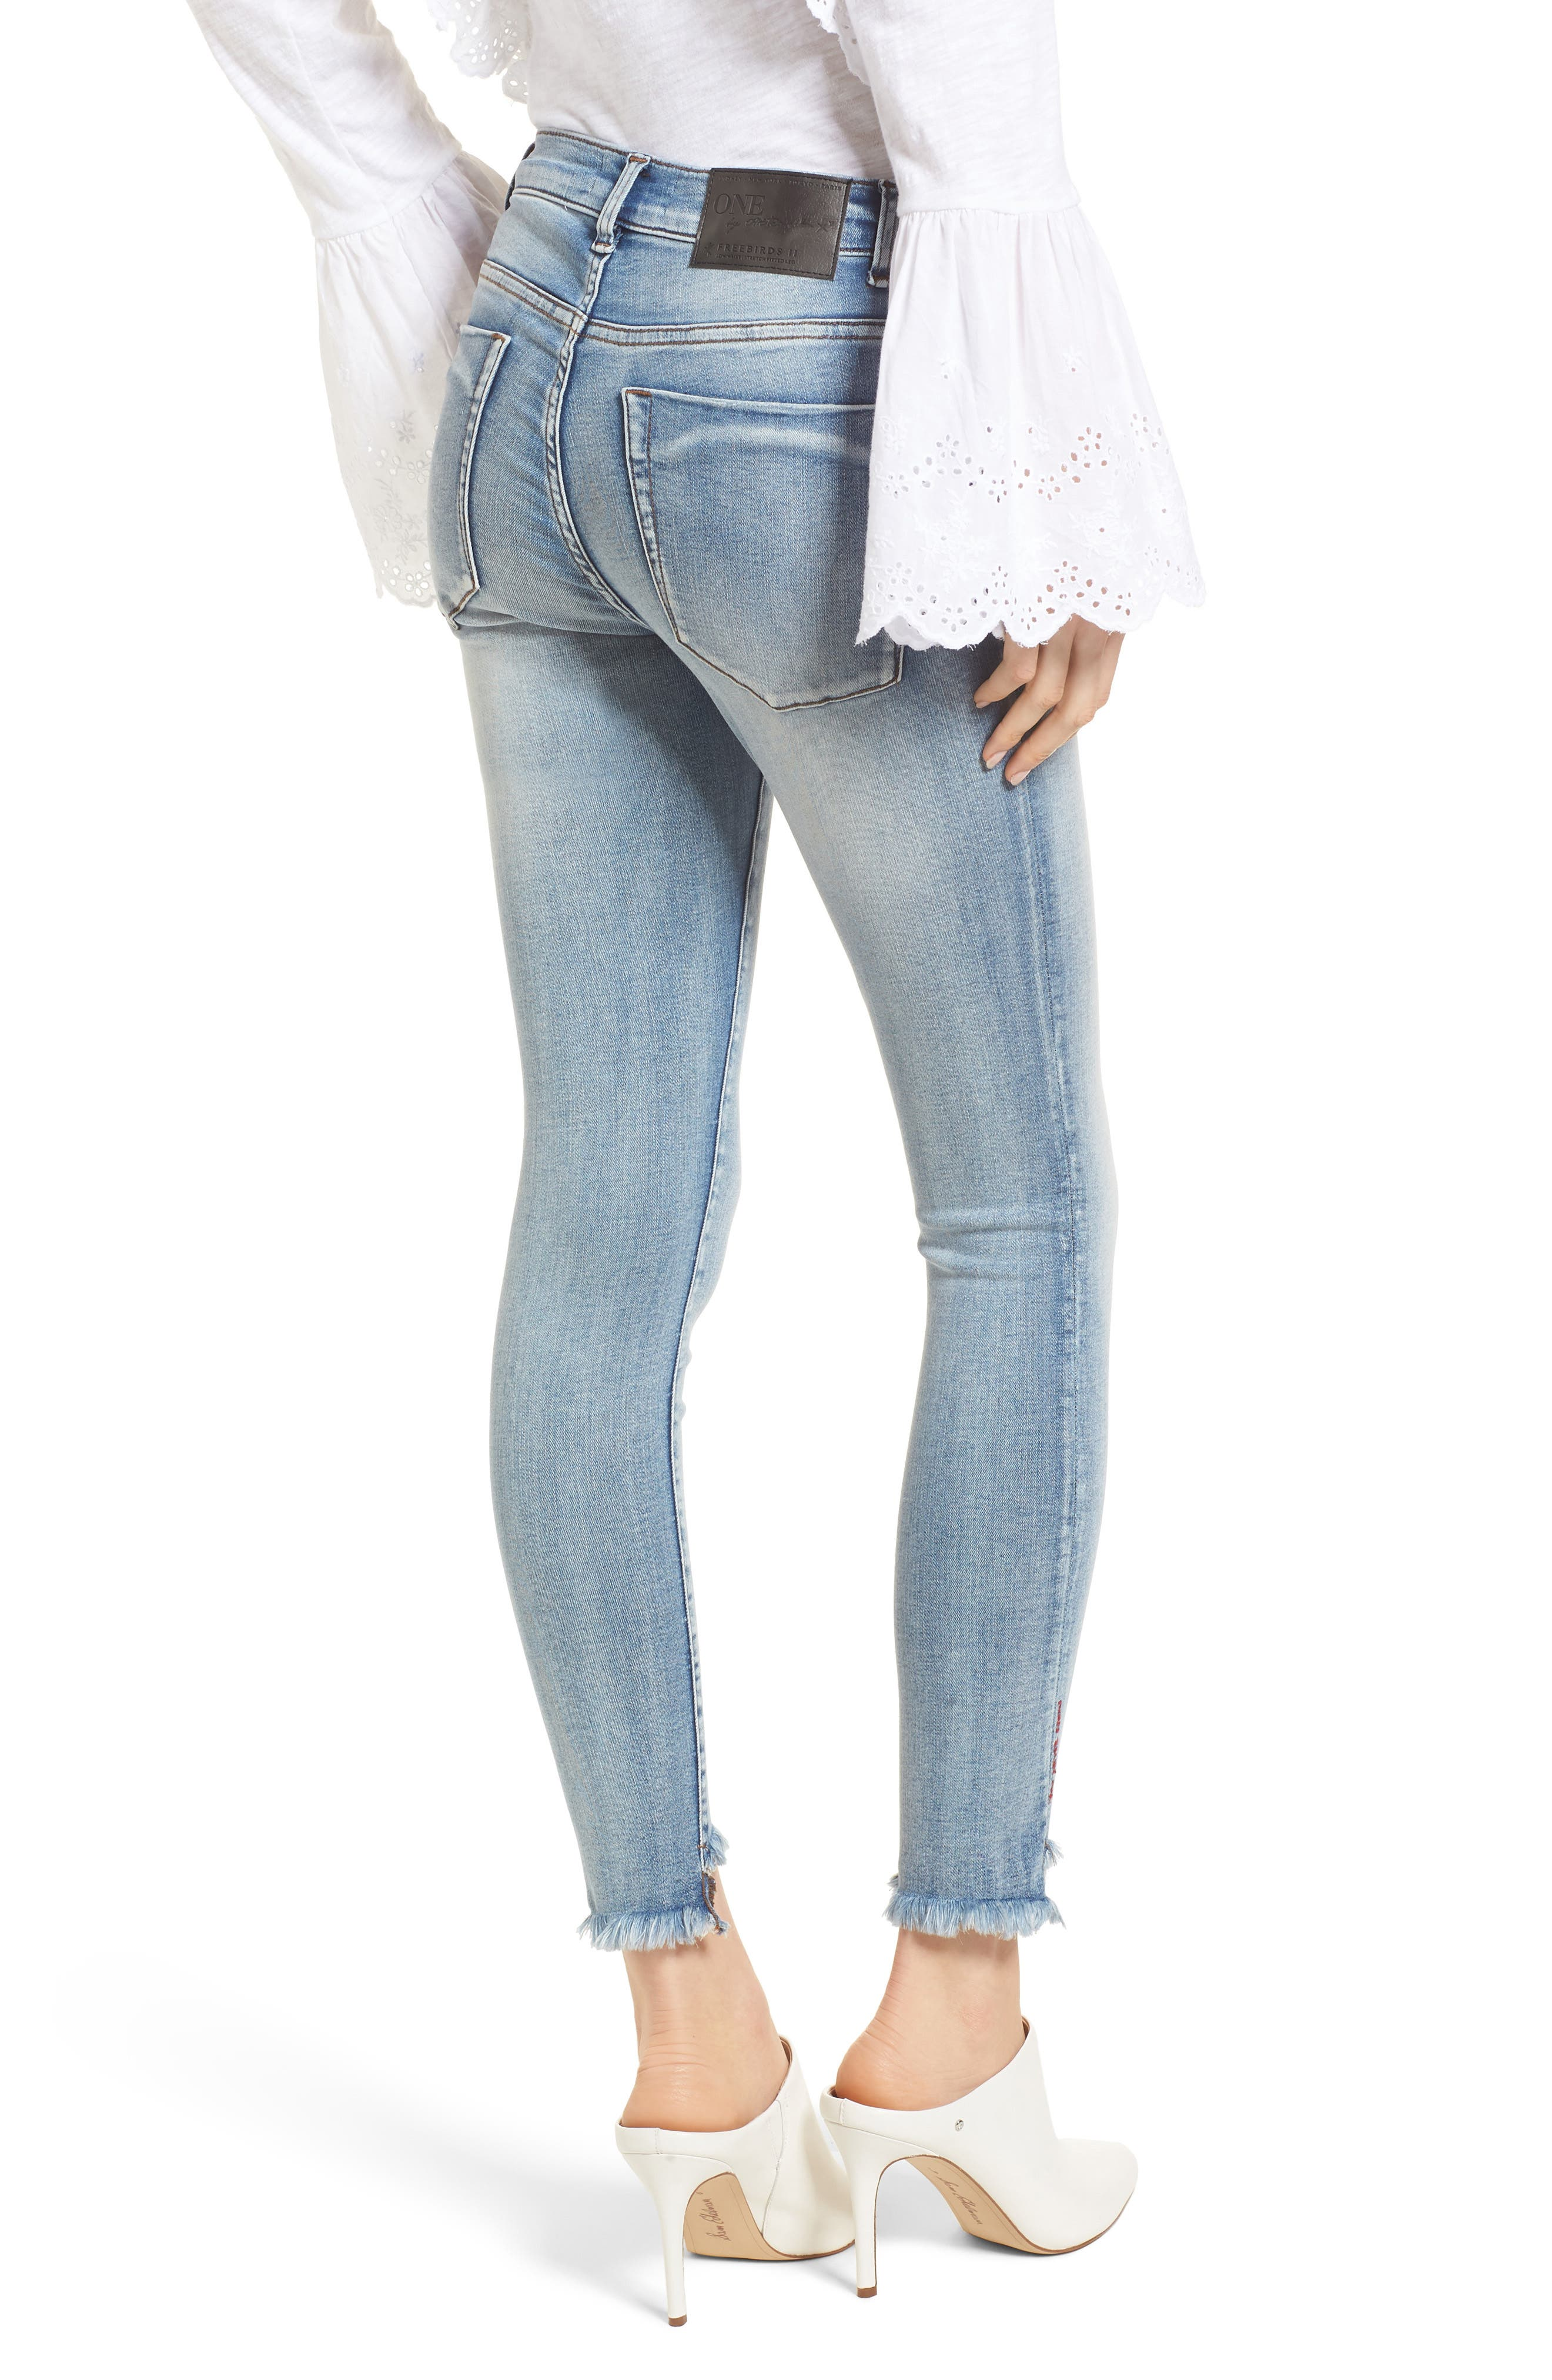 Freebirds Skinny Jeans,                             Alternate thumbnail 2, color,